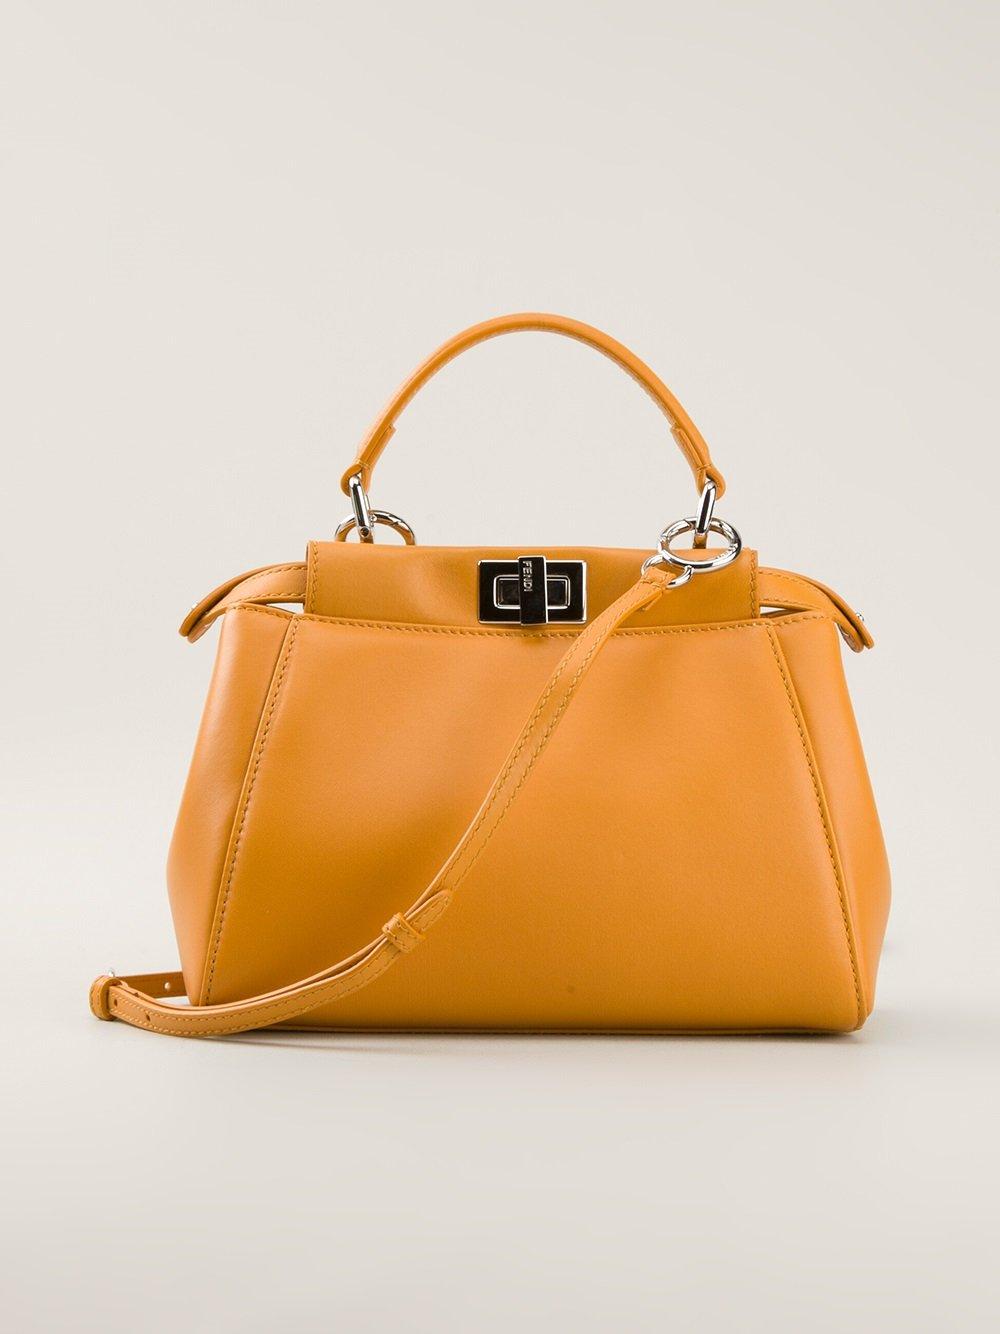 03ebe6ca6e Fendi Peekaboo Small Tote Bag in Yellow - Lyst